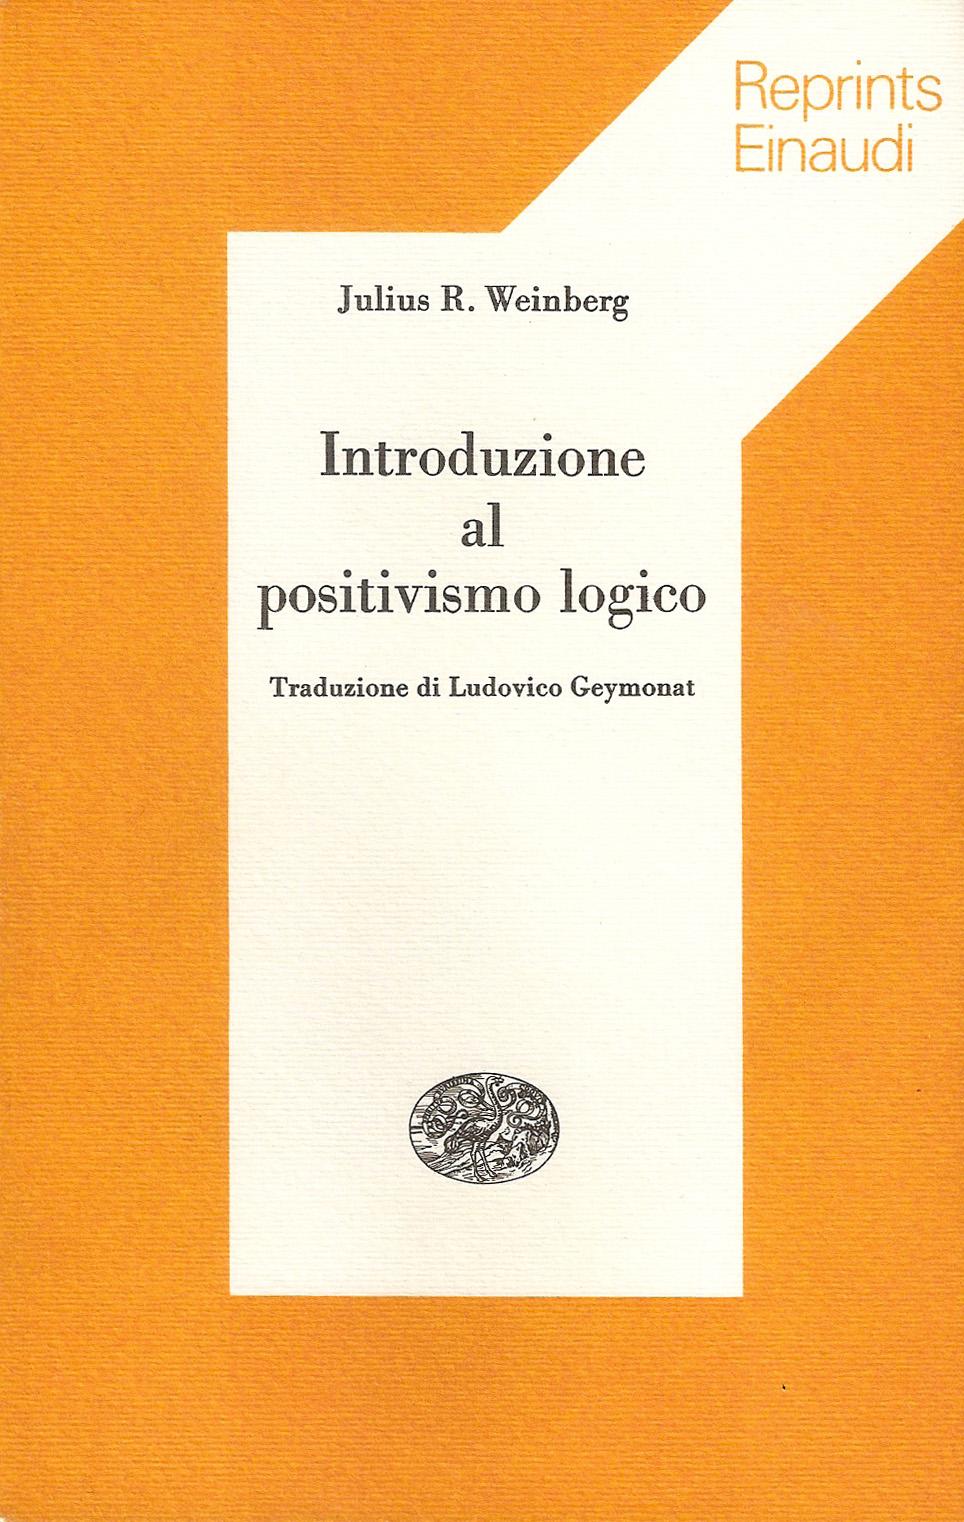 Introduzione al positivismo logico